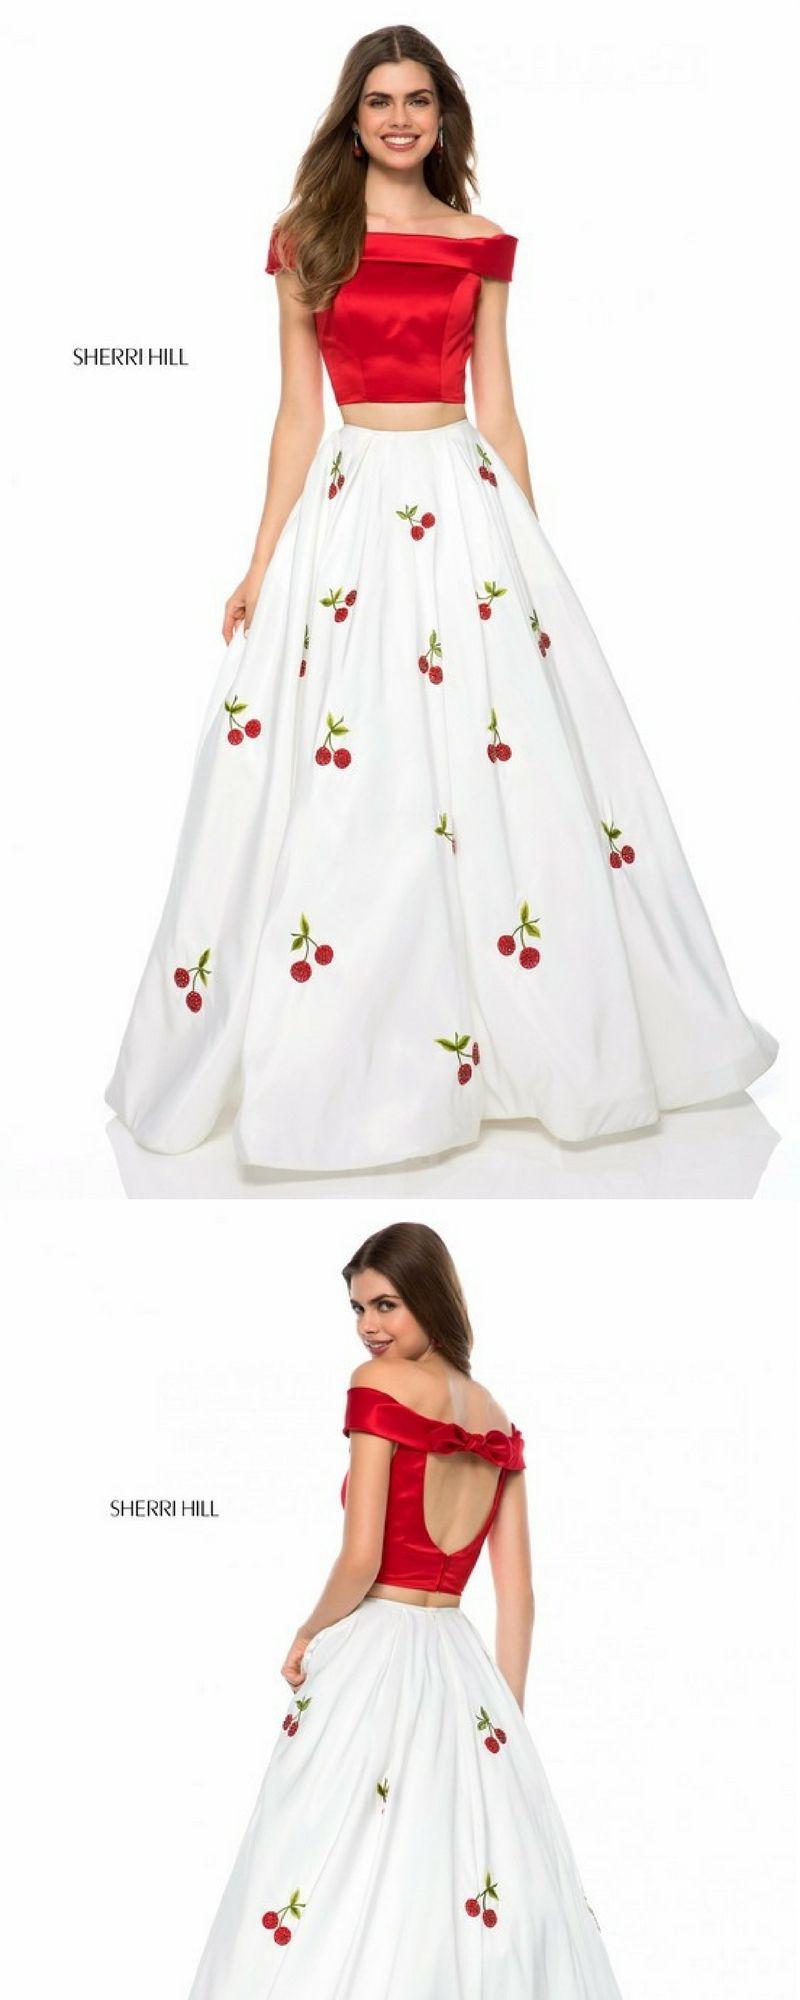 red and white cherry ballgown piece dress sherri hill print